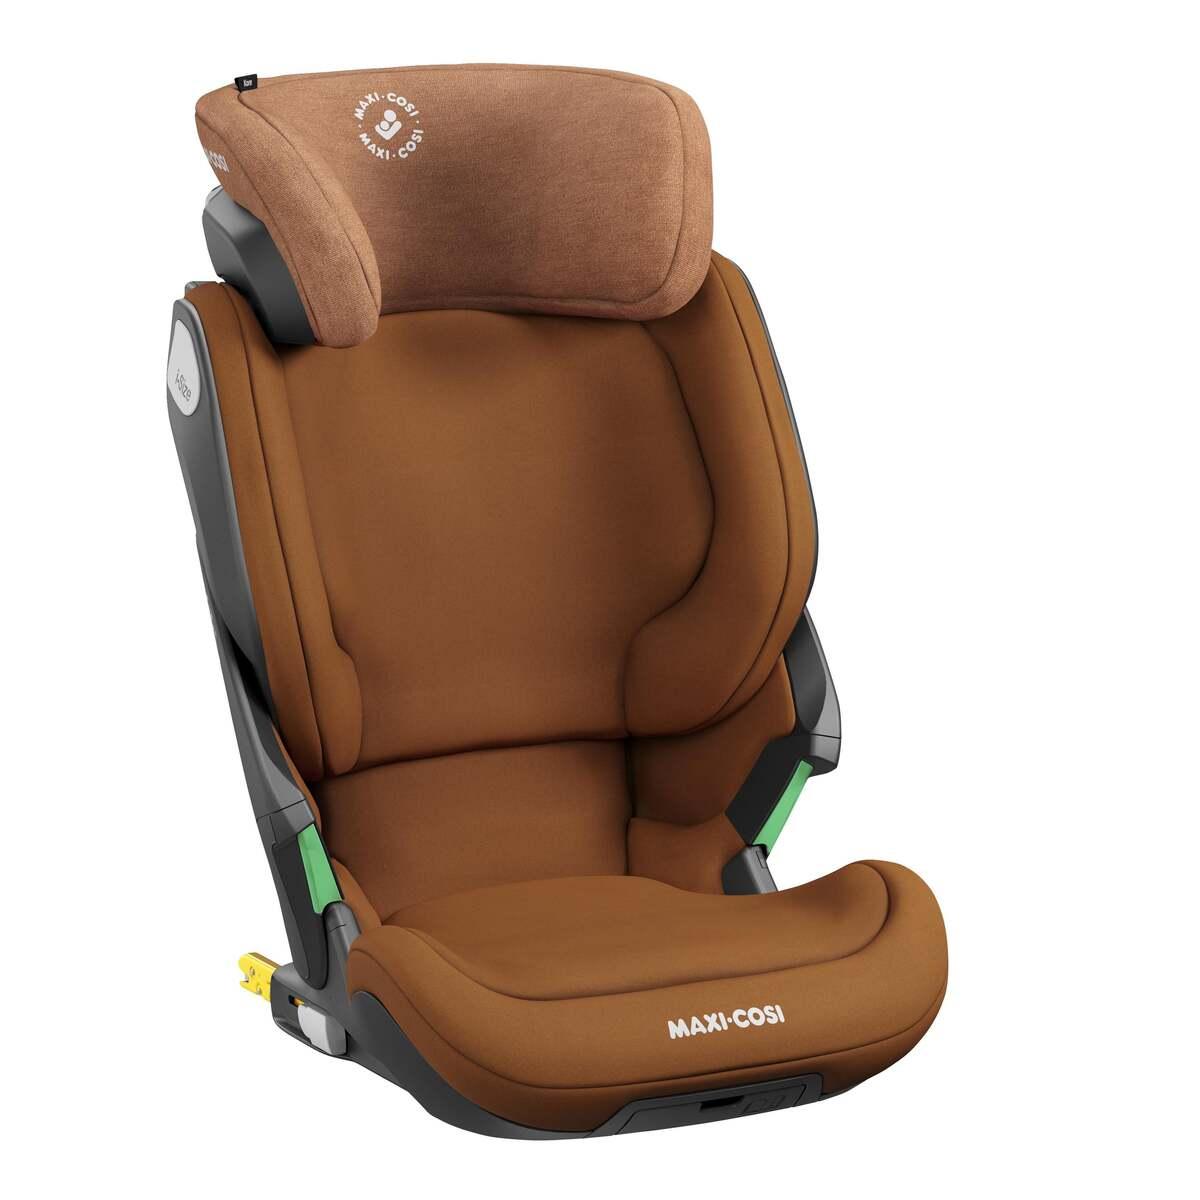 "Bild 2 von Maxi-Cosi Auto-Kindersitz ""Kore i-Size"", Authentic Cognac"